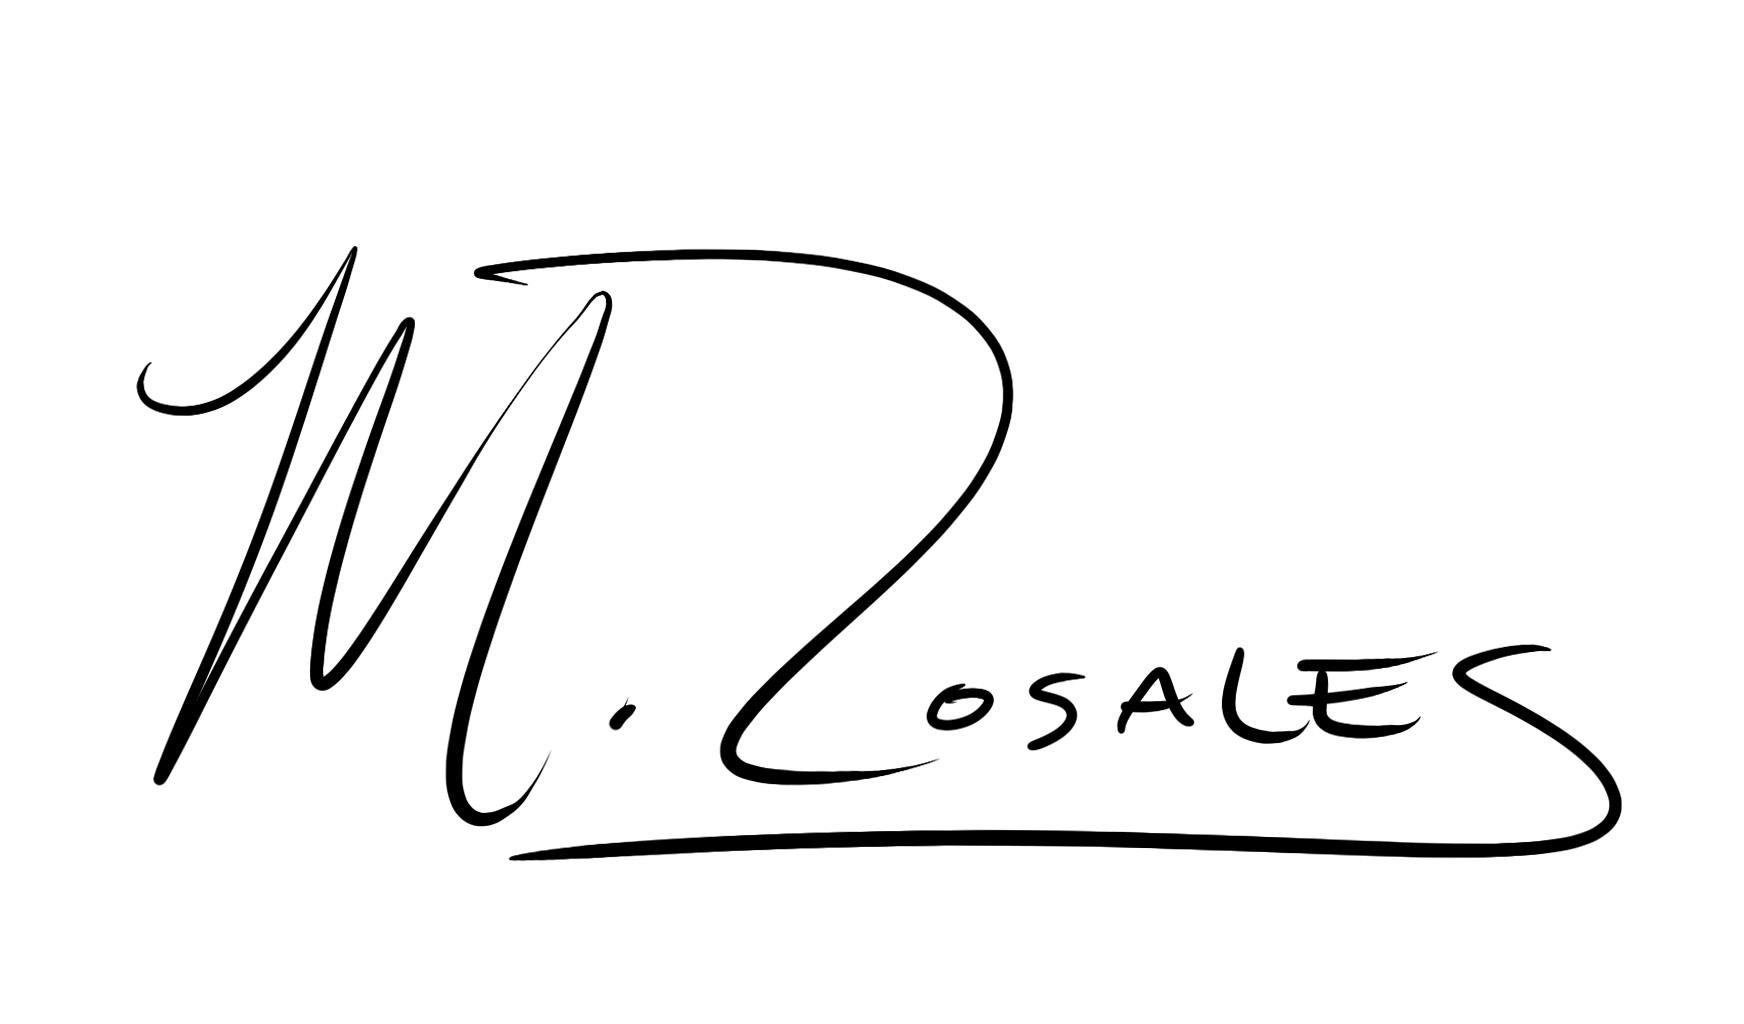 Maya Rosales's Signature